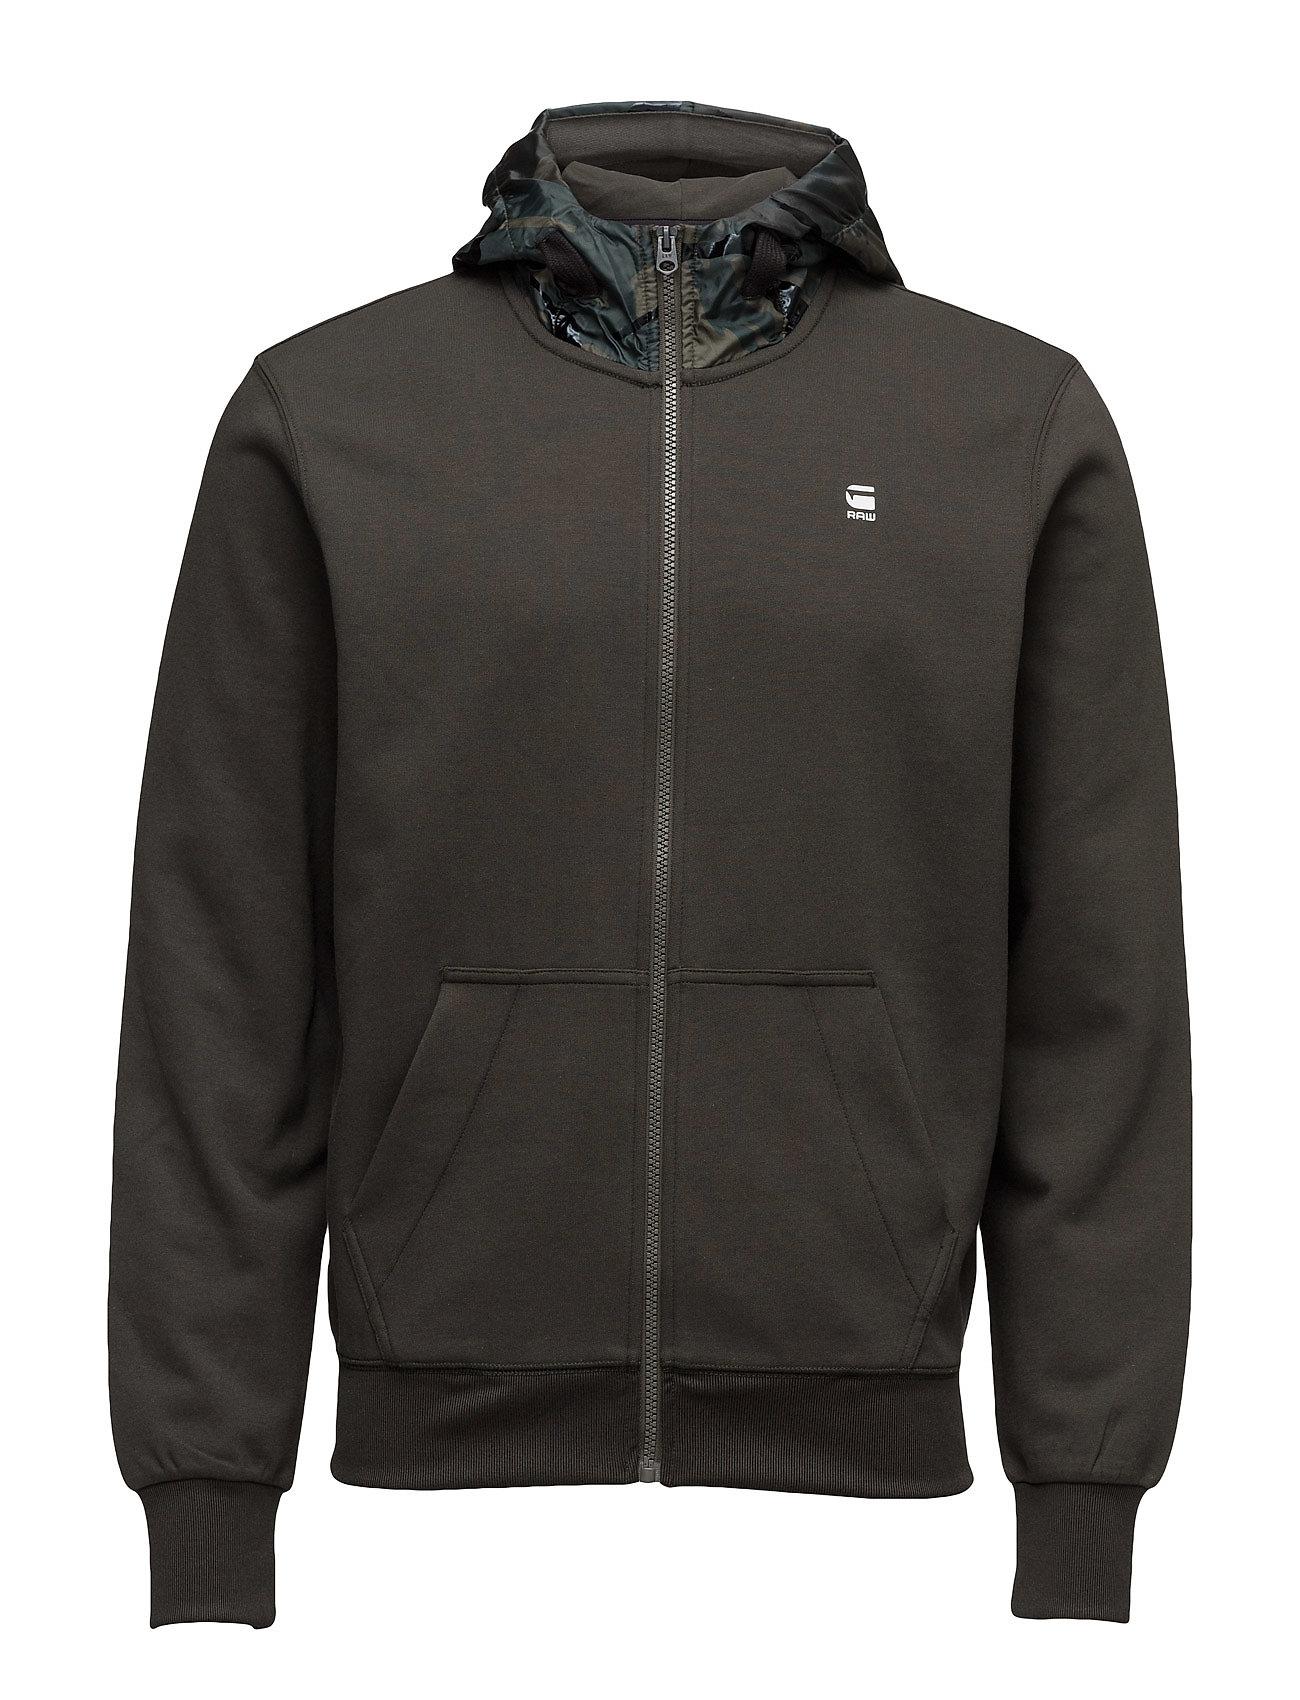 g-star – Core hooded zip sw l på boozt.com dk